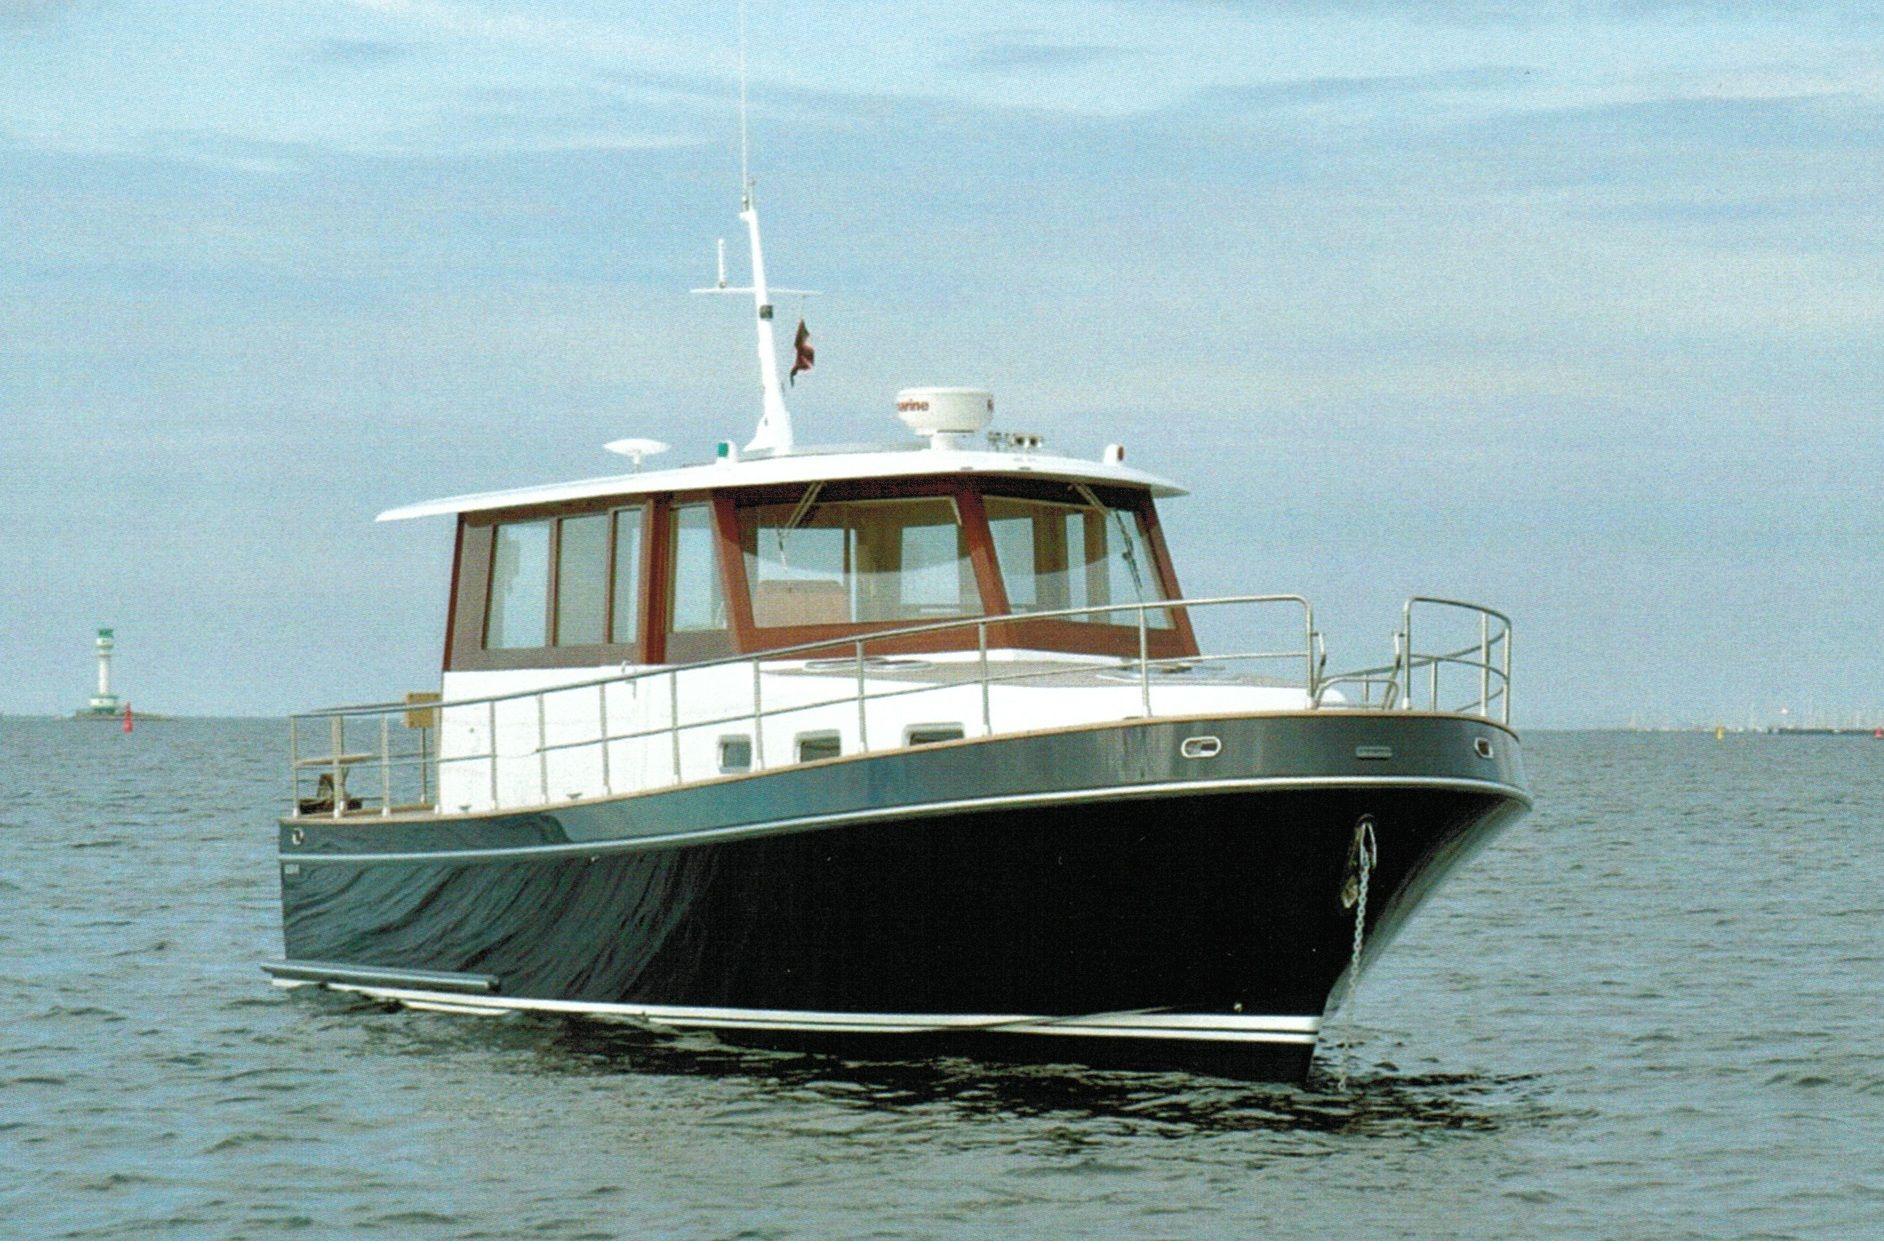 2009 algro yachting algro 45 cabin cruiser power boat for